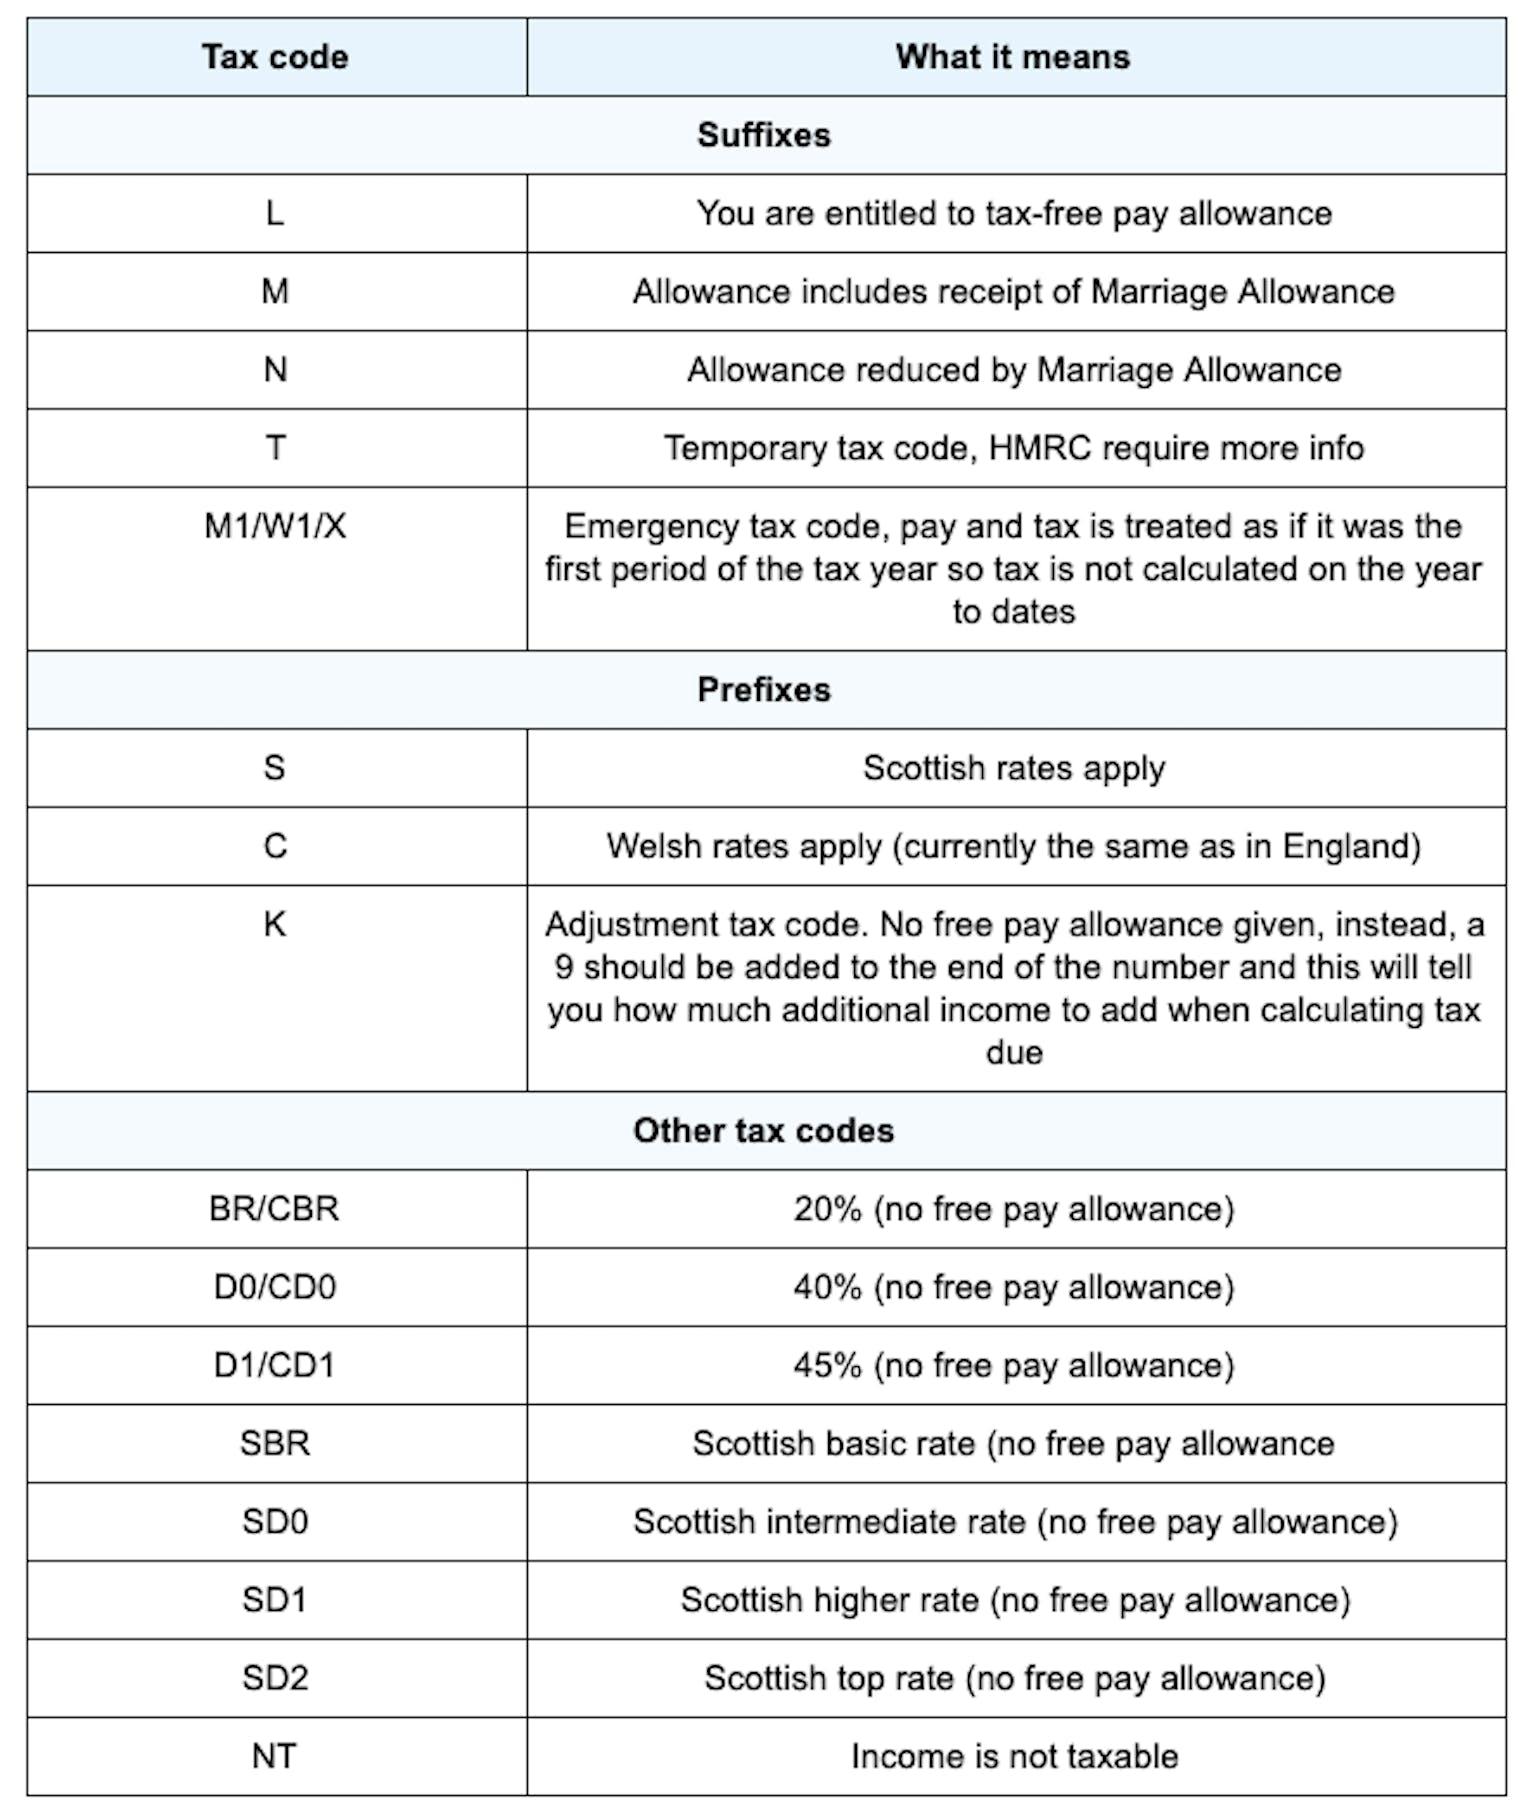 Tax codes.